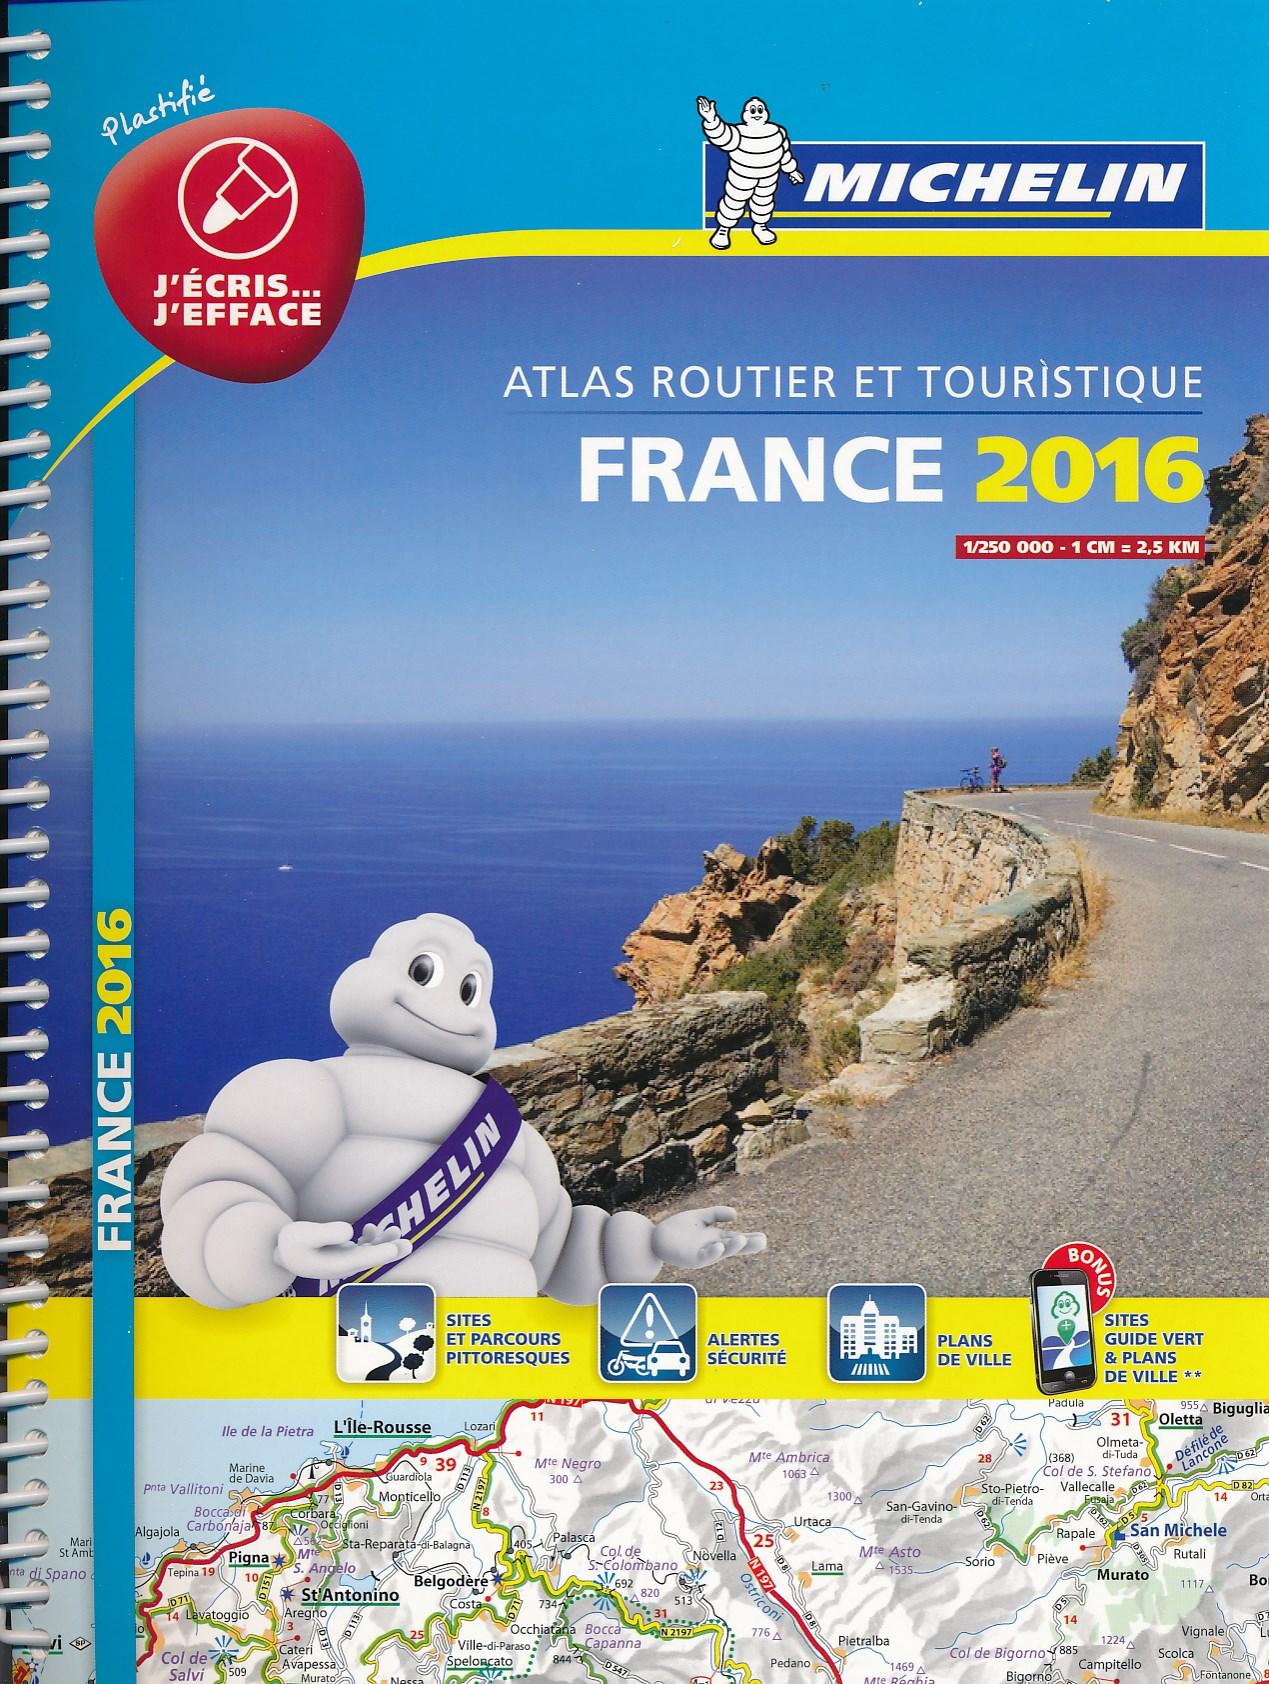 Wegenatlas Frankrijk - Atlas Routier et Touristique France 2016   Michelin